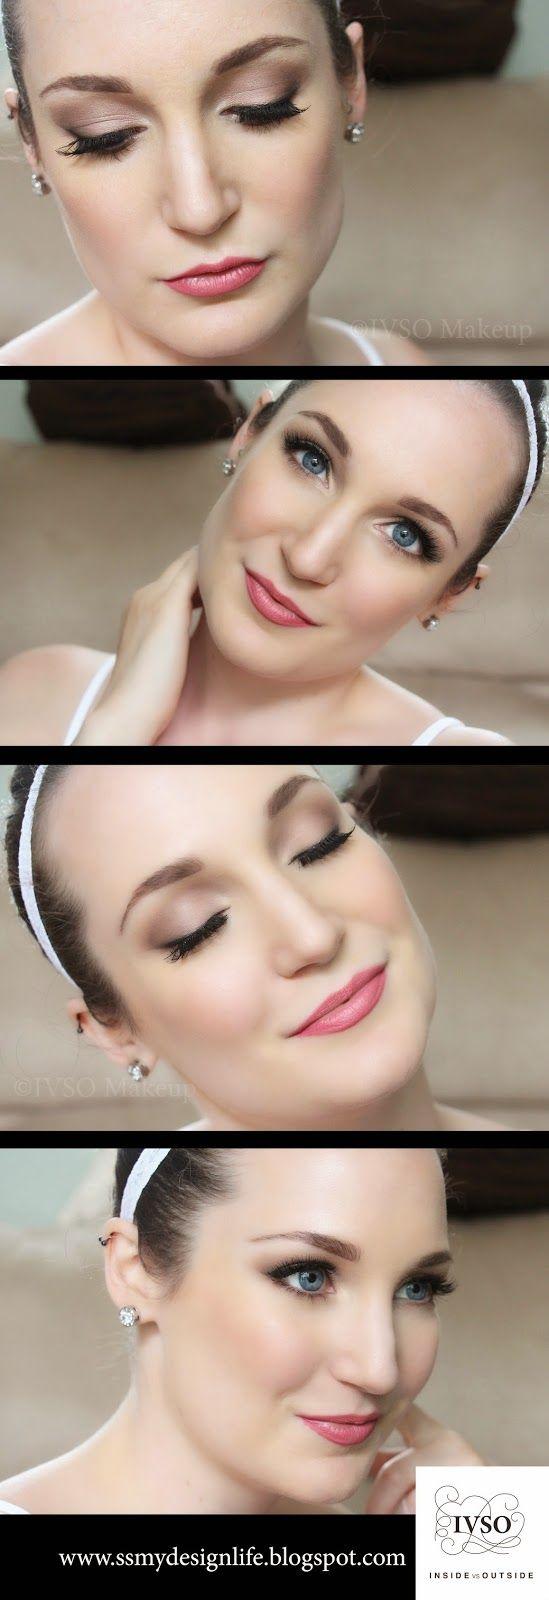 Easy DIY Bridal Makeup Tutorial!  More tutorials at www.ssmydesignlife.blogspot.com